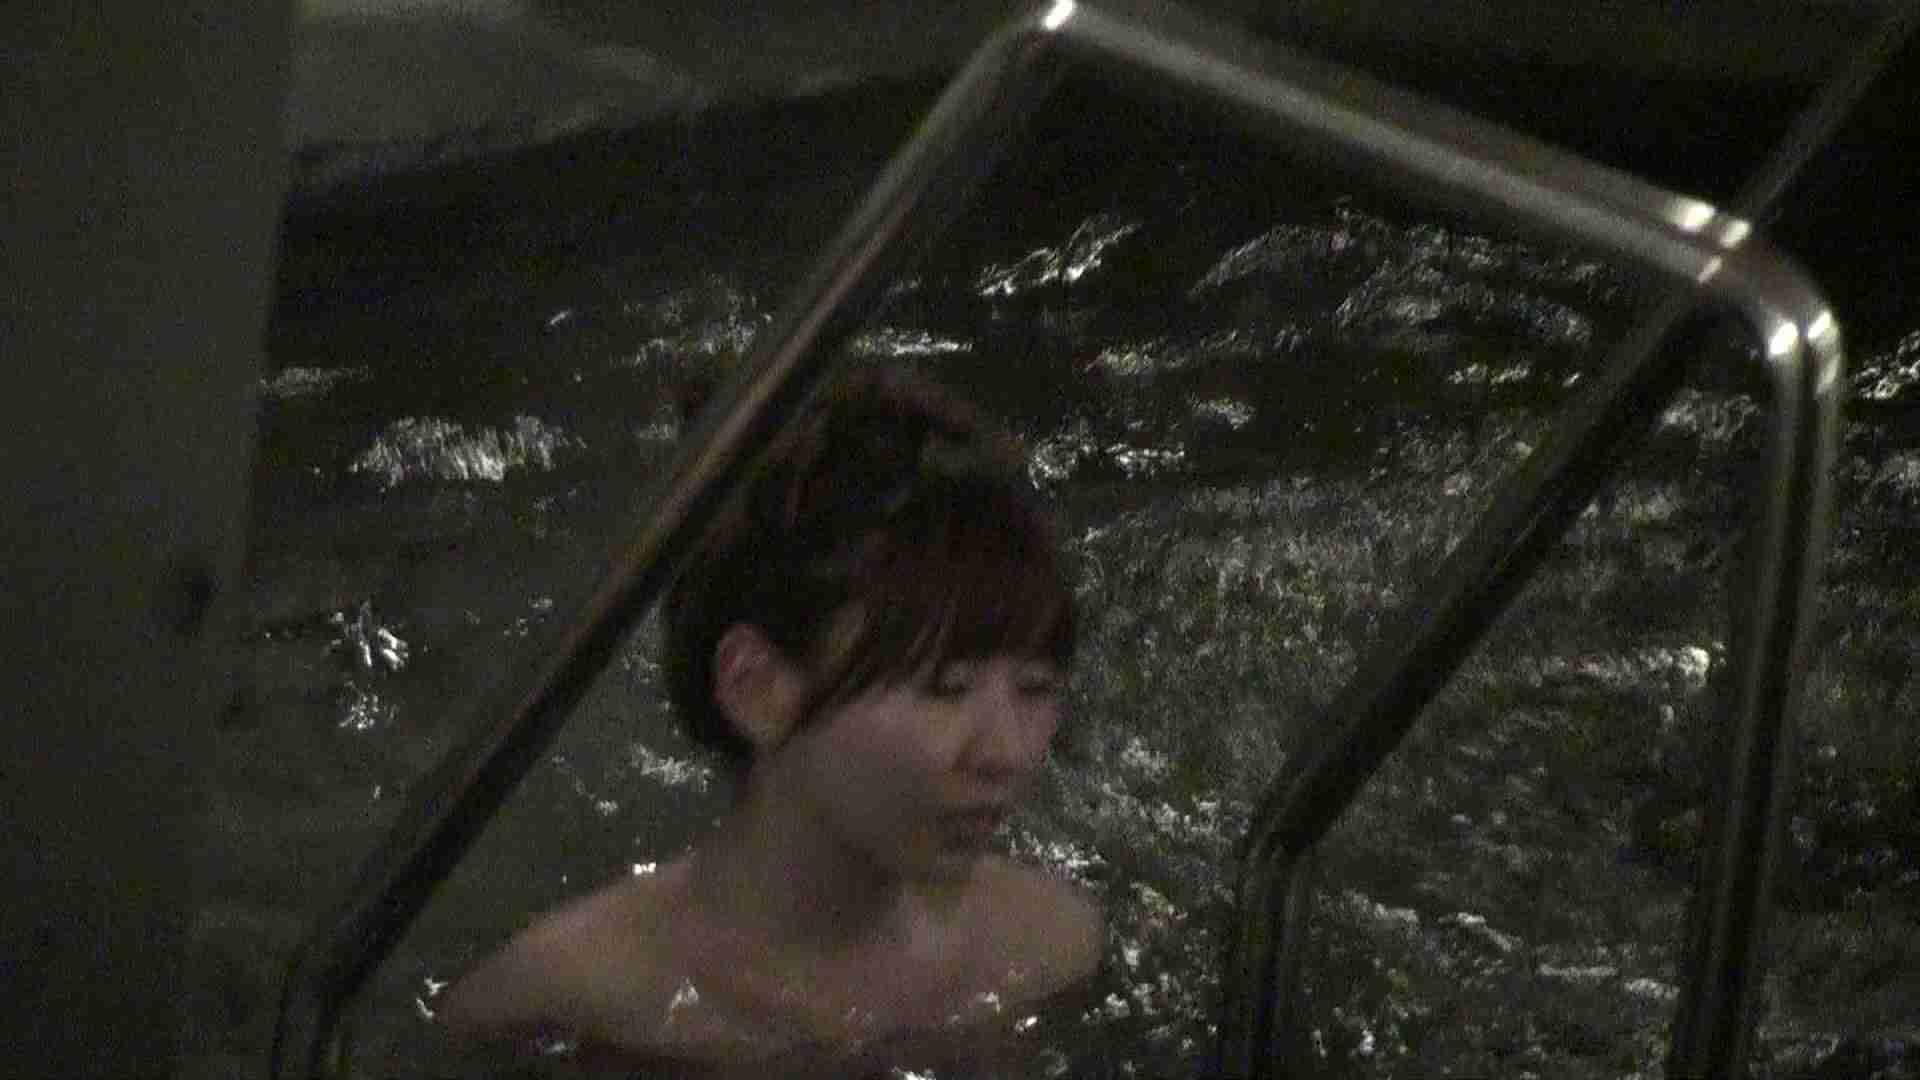 Aquaな露天風呂Vol.410 露天風呂編  94PIX 82